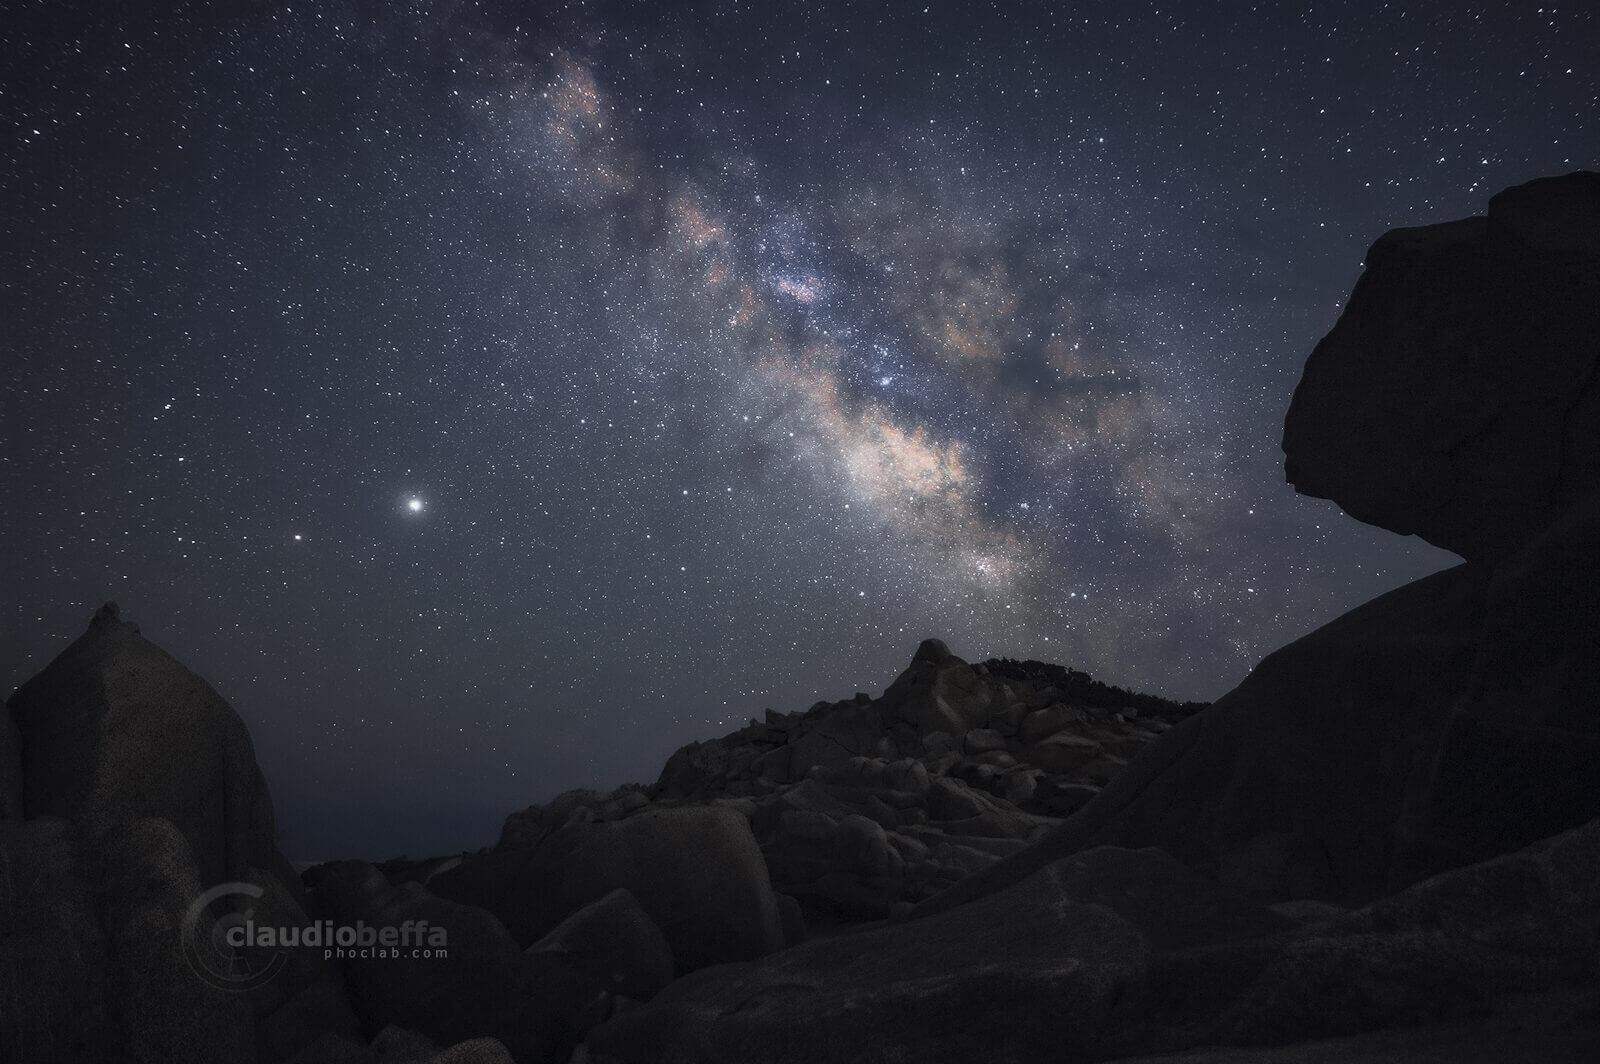 Milky Way, core, stars, Jupiter, night, rocks, stones, astrophotography, nightphotography, sardinia, italy, landscape